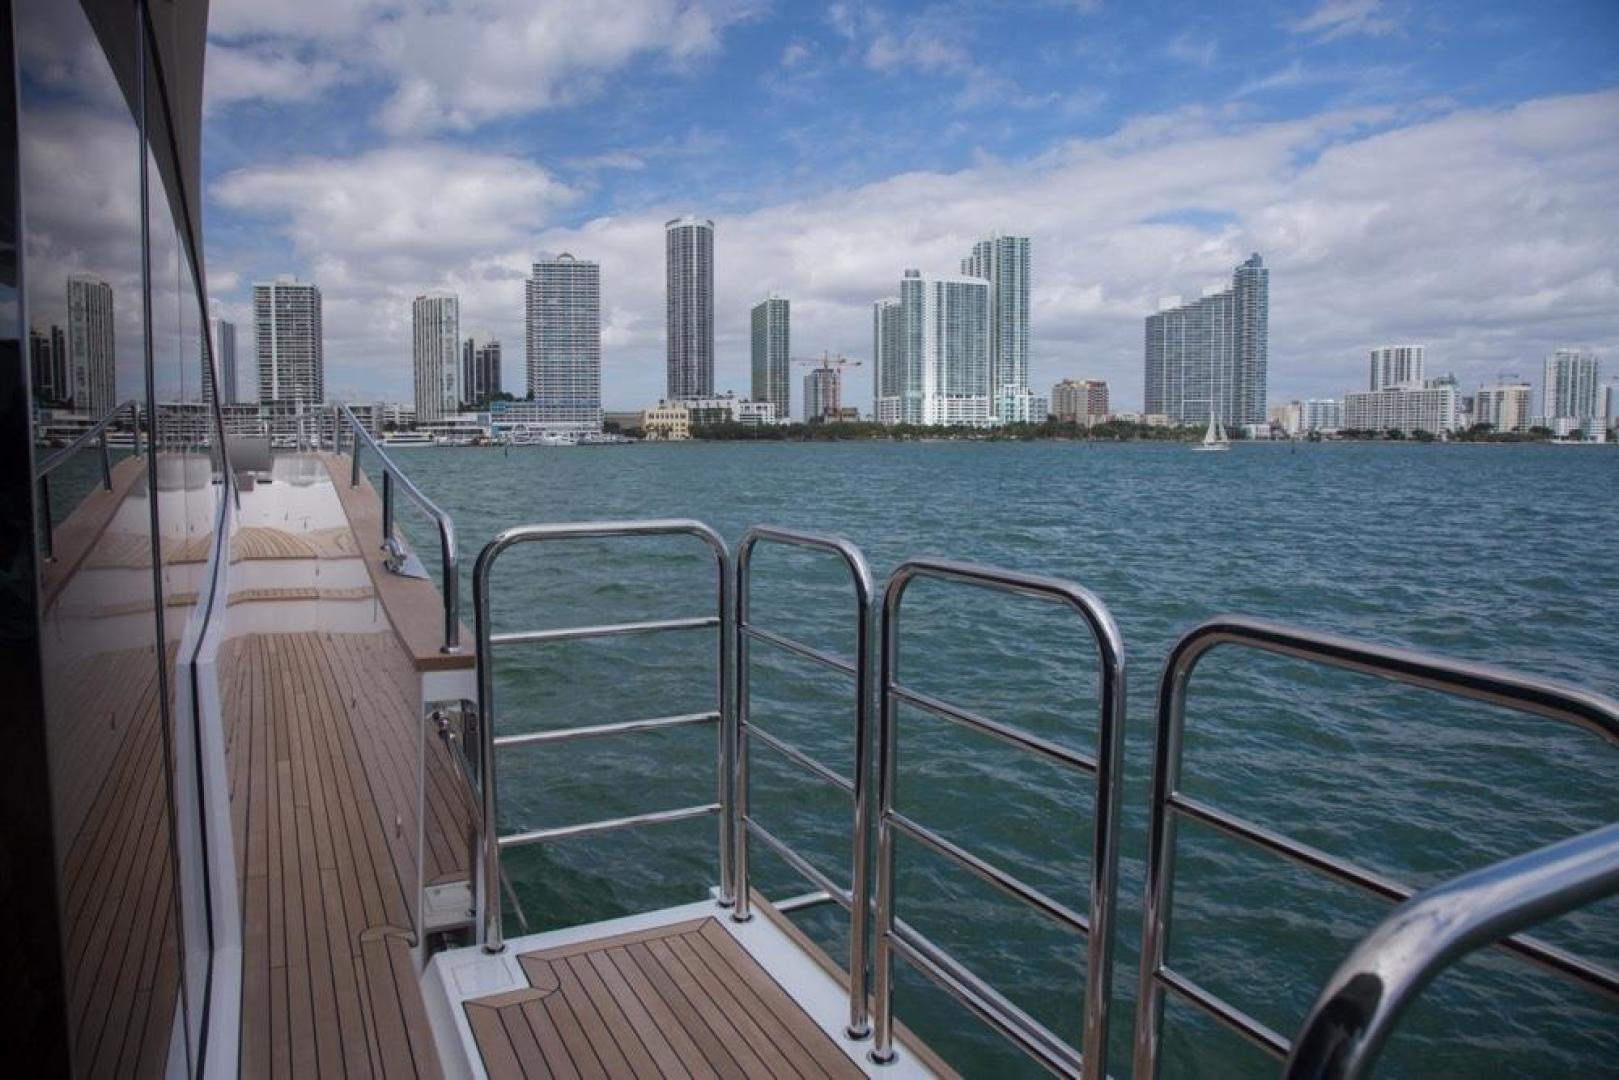 Sunseeker-28 Metre Yacht 2016-RIII Miami-Florida-United States-600082 | Thumbnail